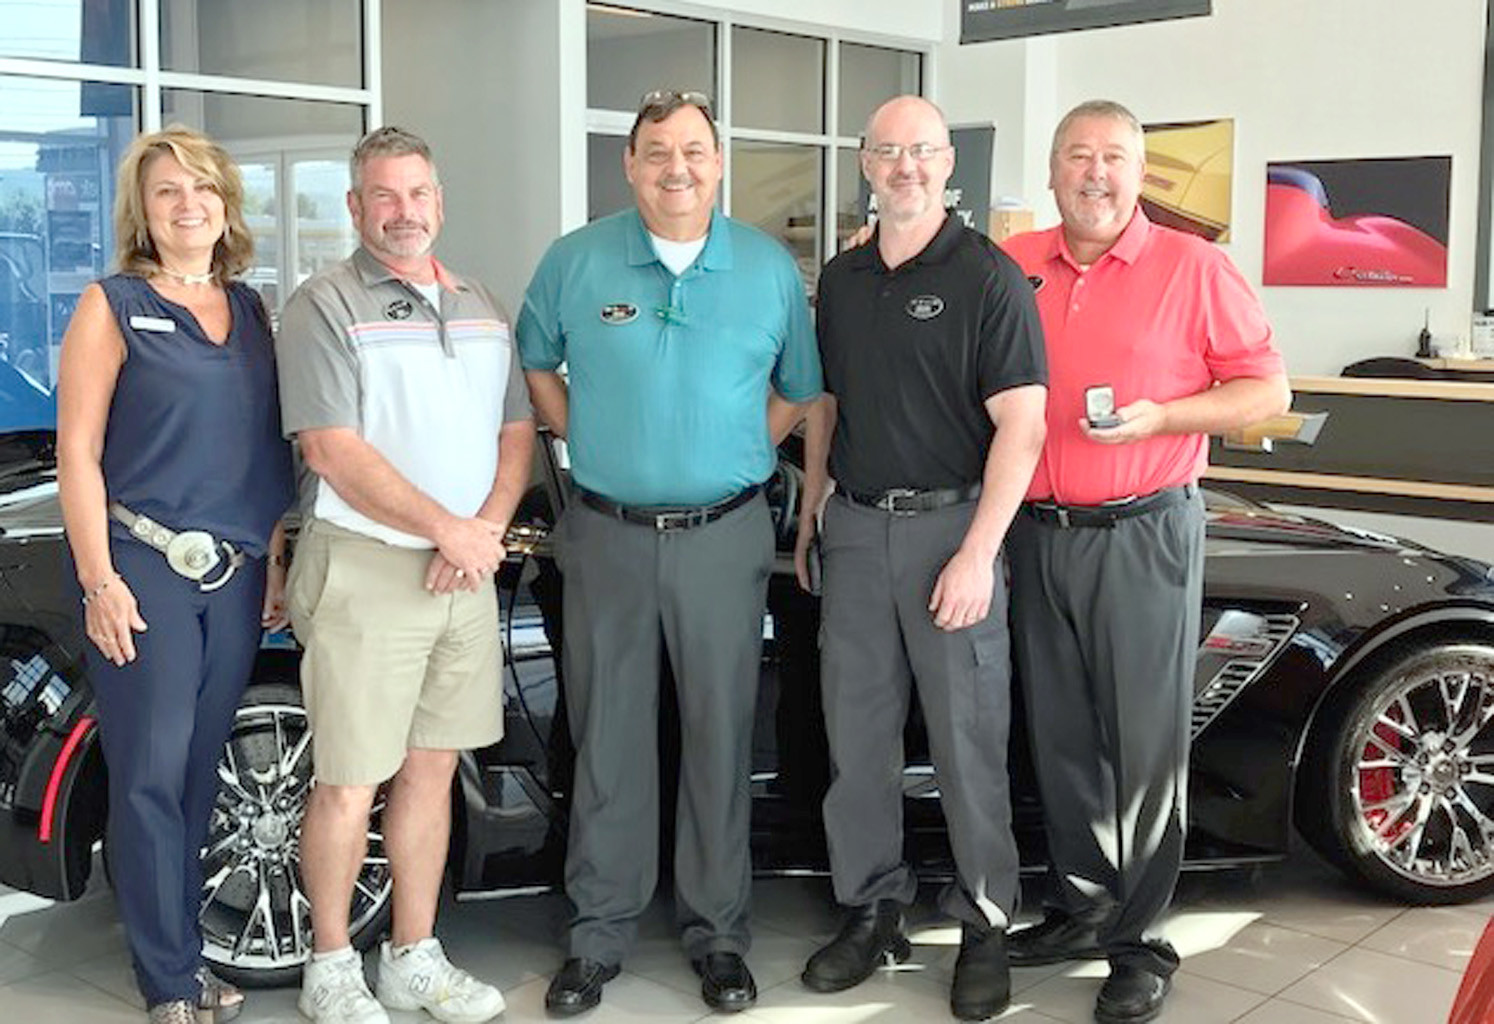 Don Ledford Athens Tn >> Don Ledford Receives Award The Cleveland Daily Banner